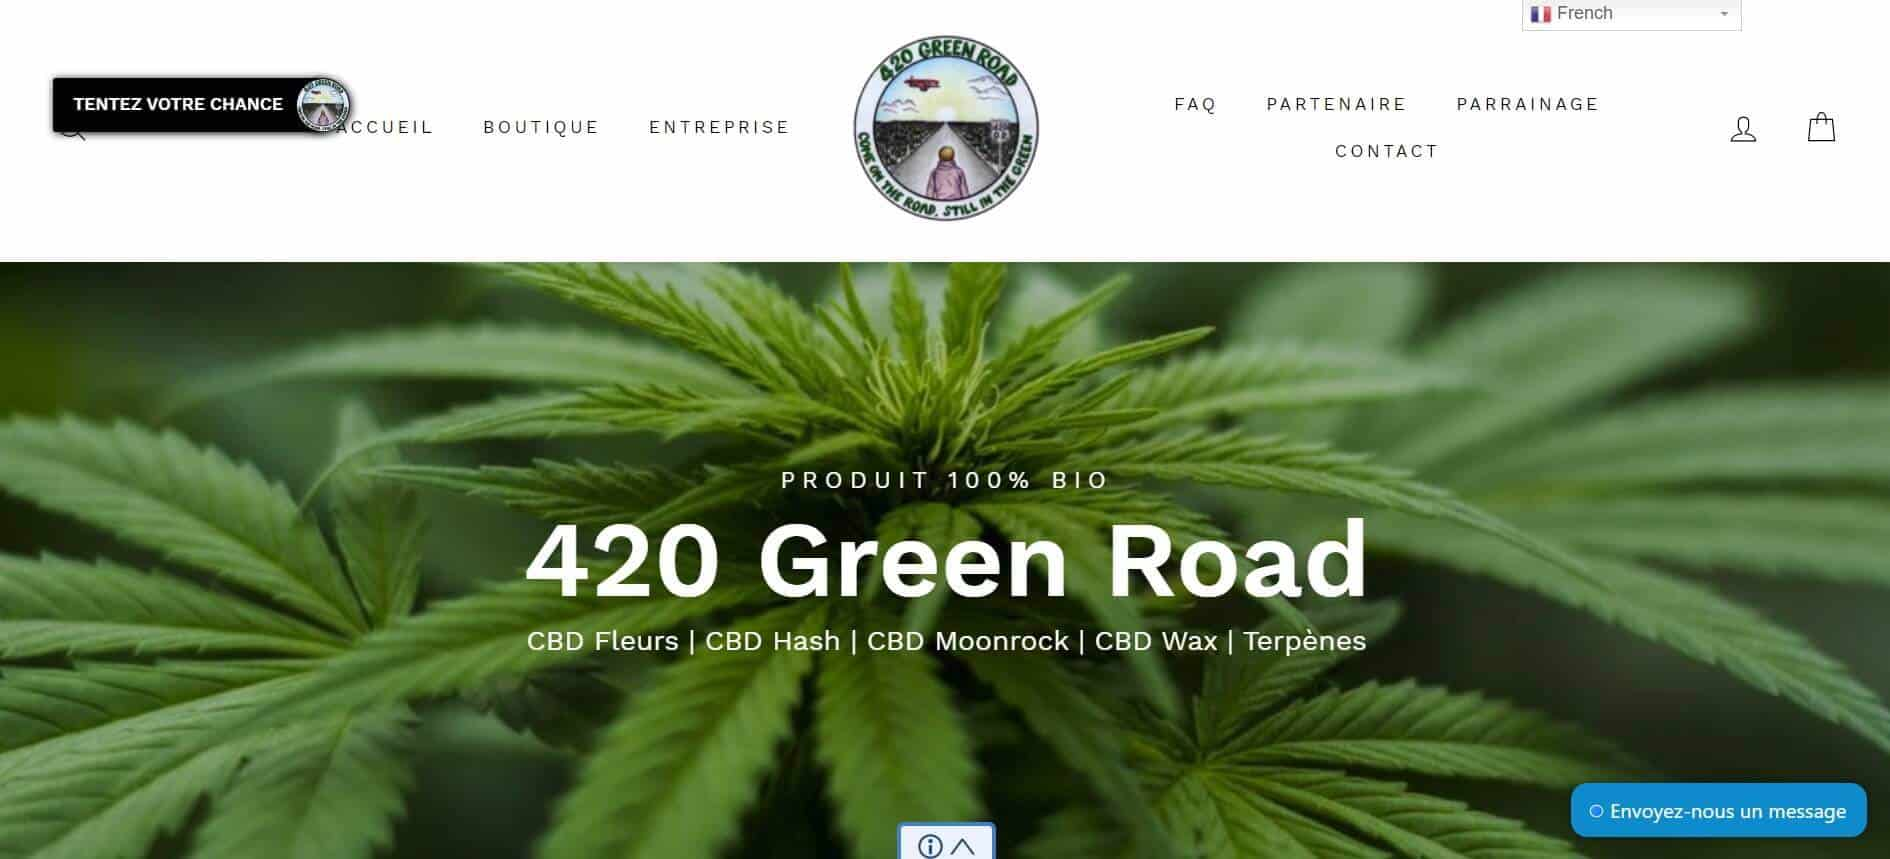 420 green road site web